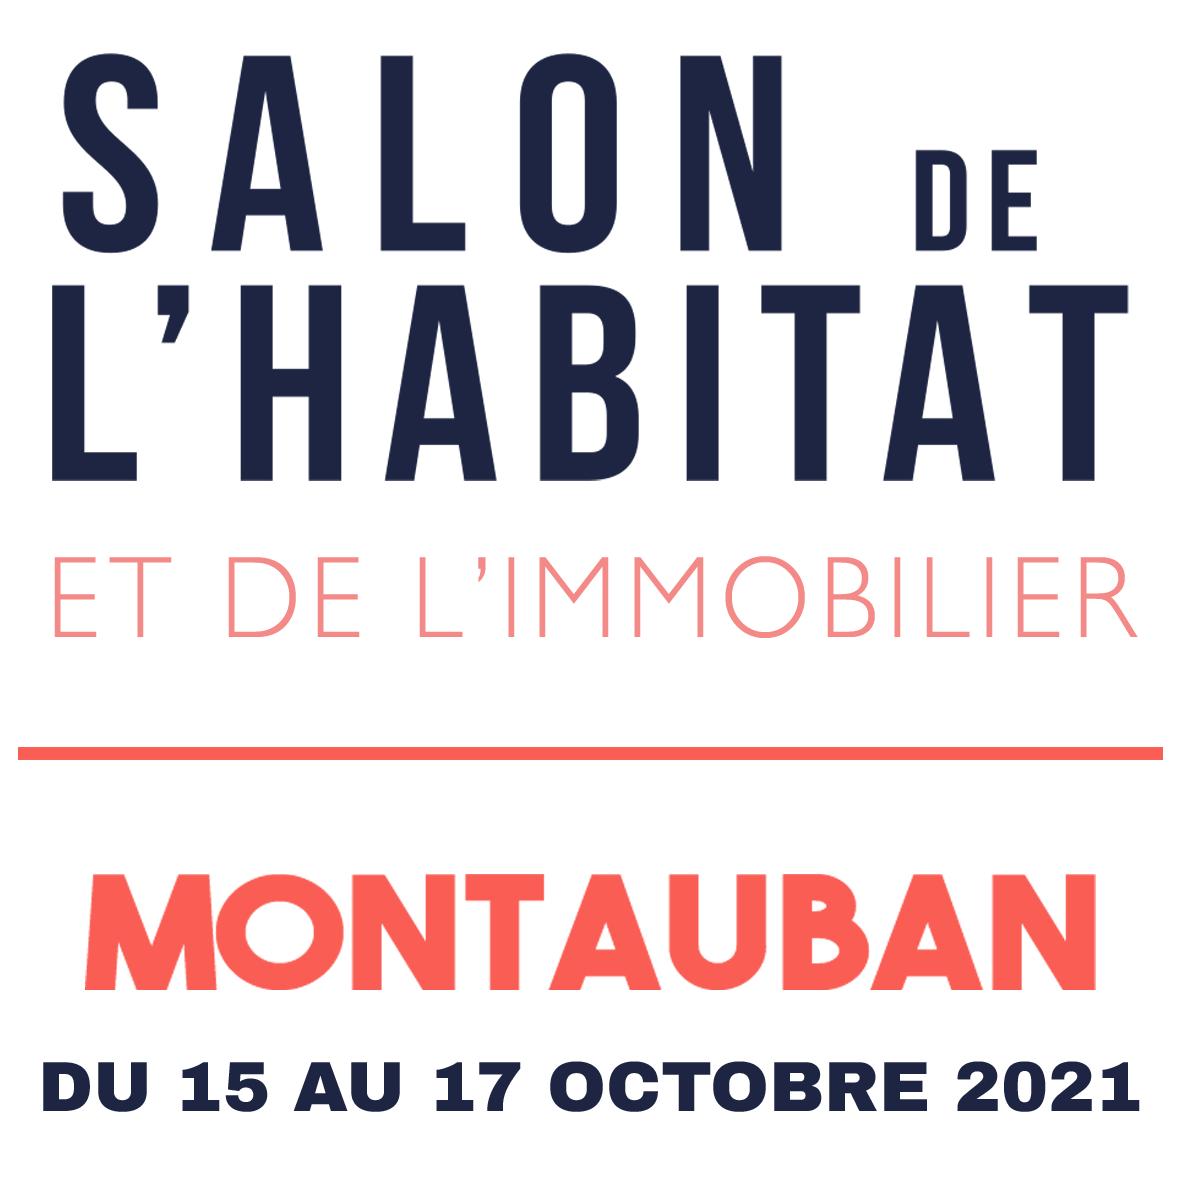 Salon-Habitat-Montauban-immobilier-2021